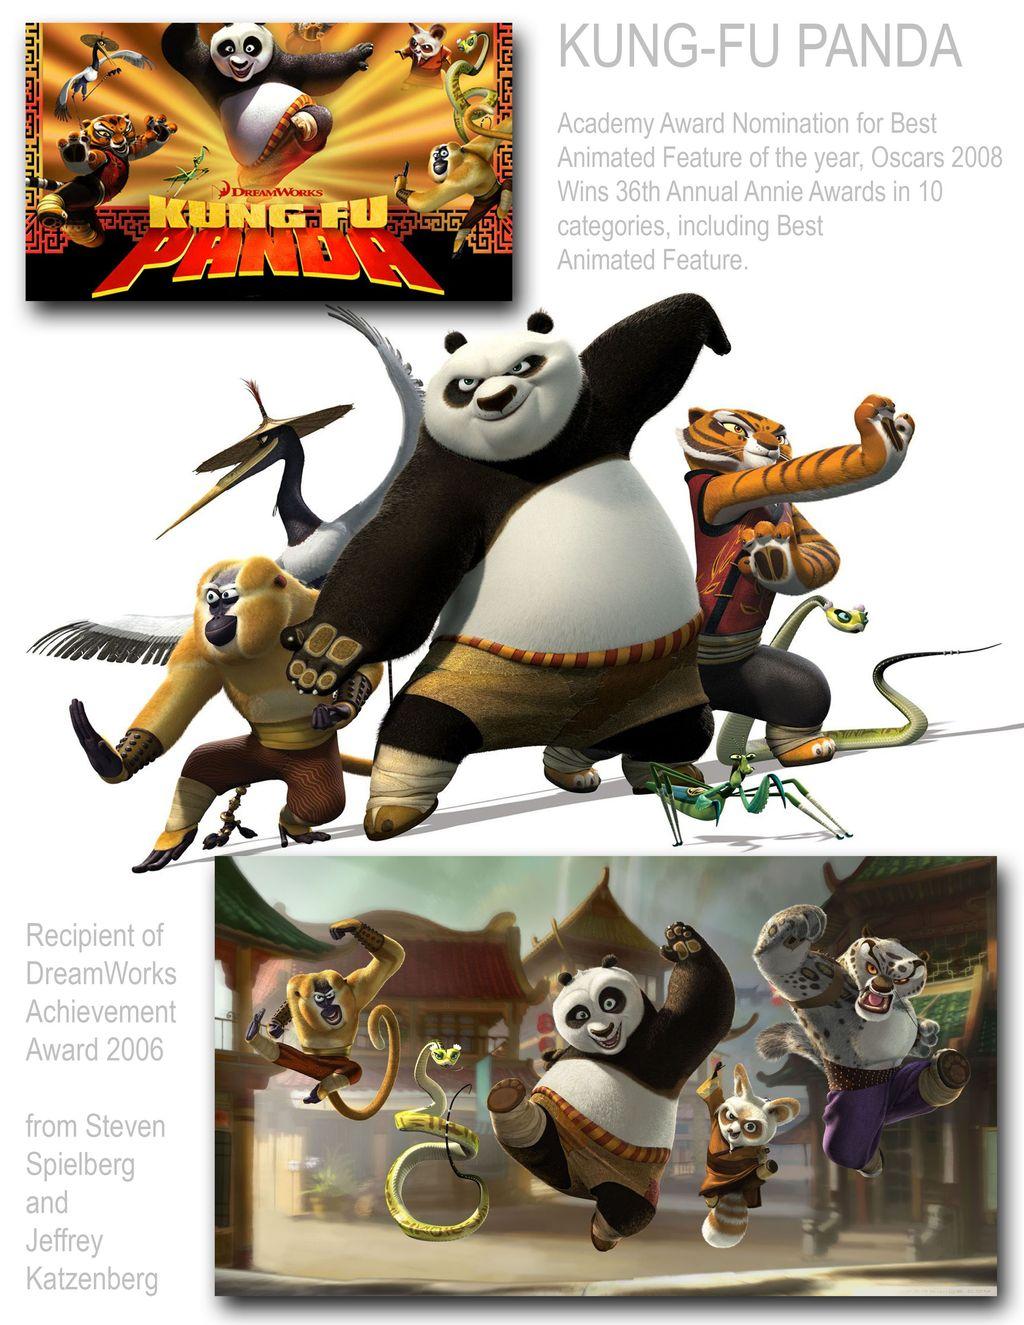 Kung Fu Panda - 130 Million production cost